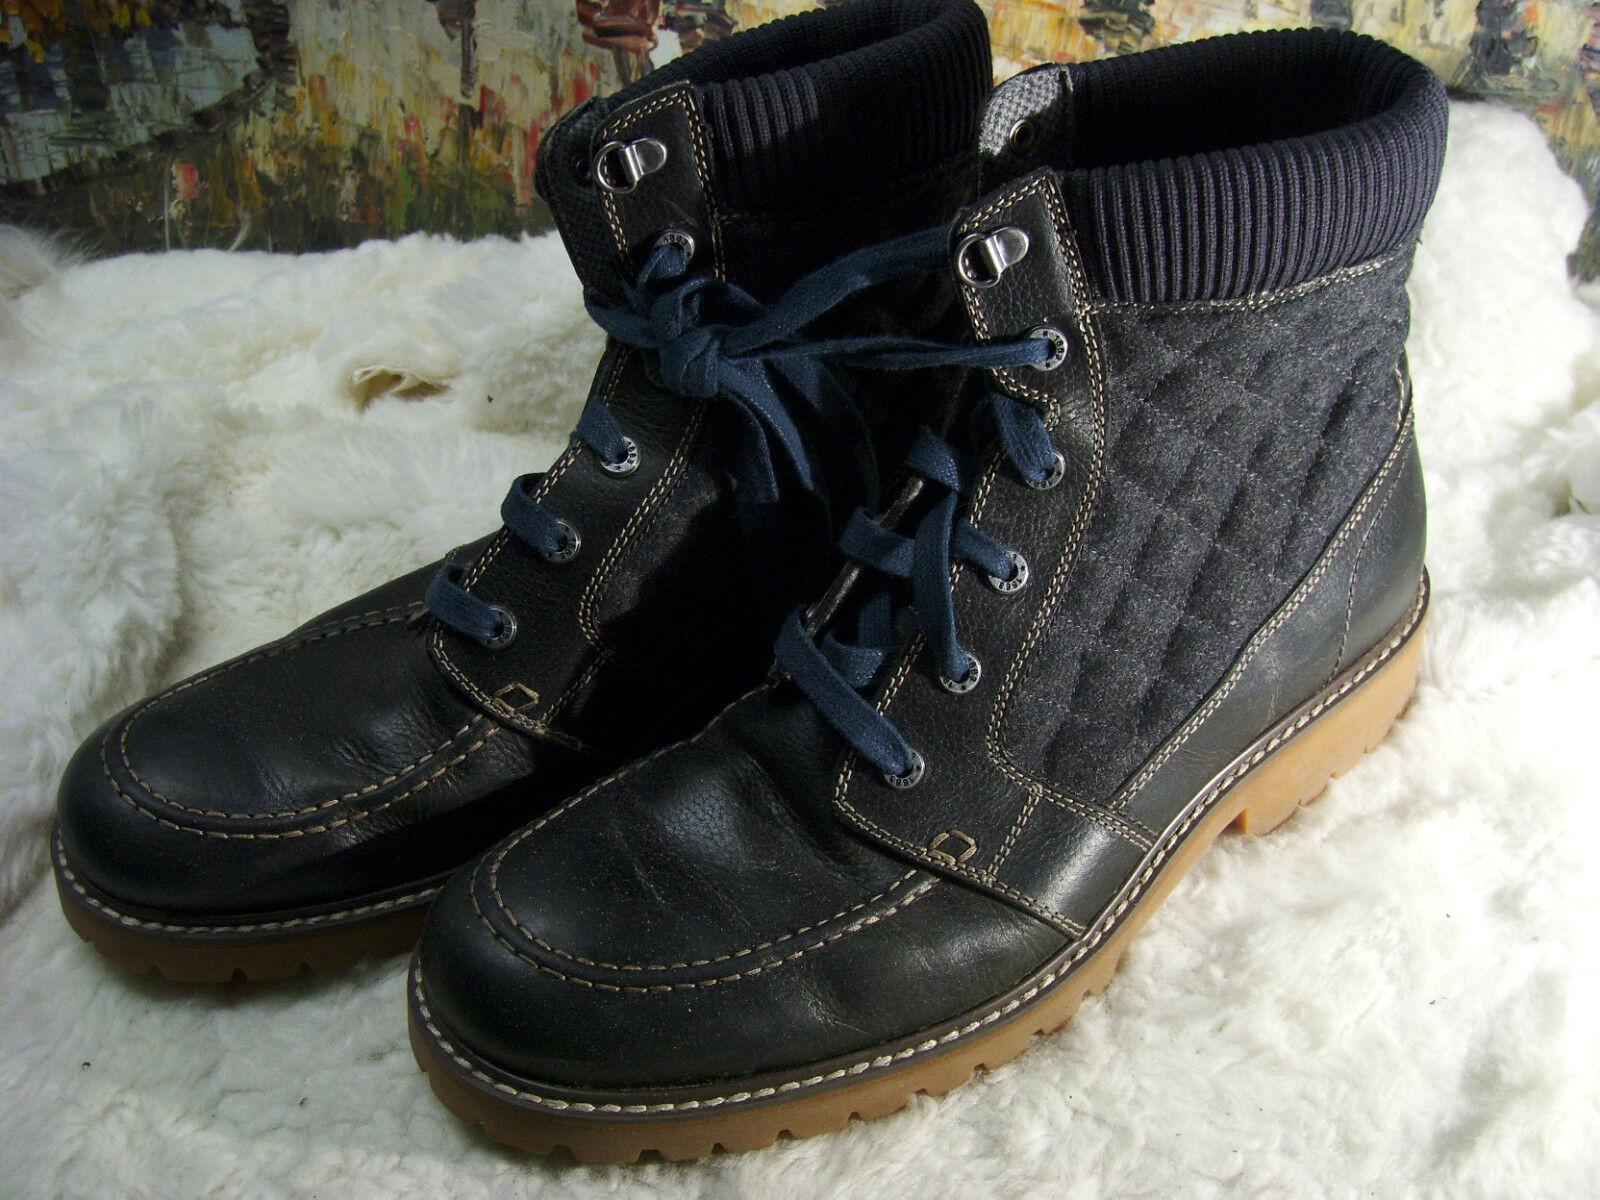 Wolverine 'Birch' Moc Toe Boot - Size 12D -  190